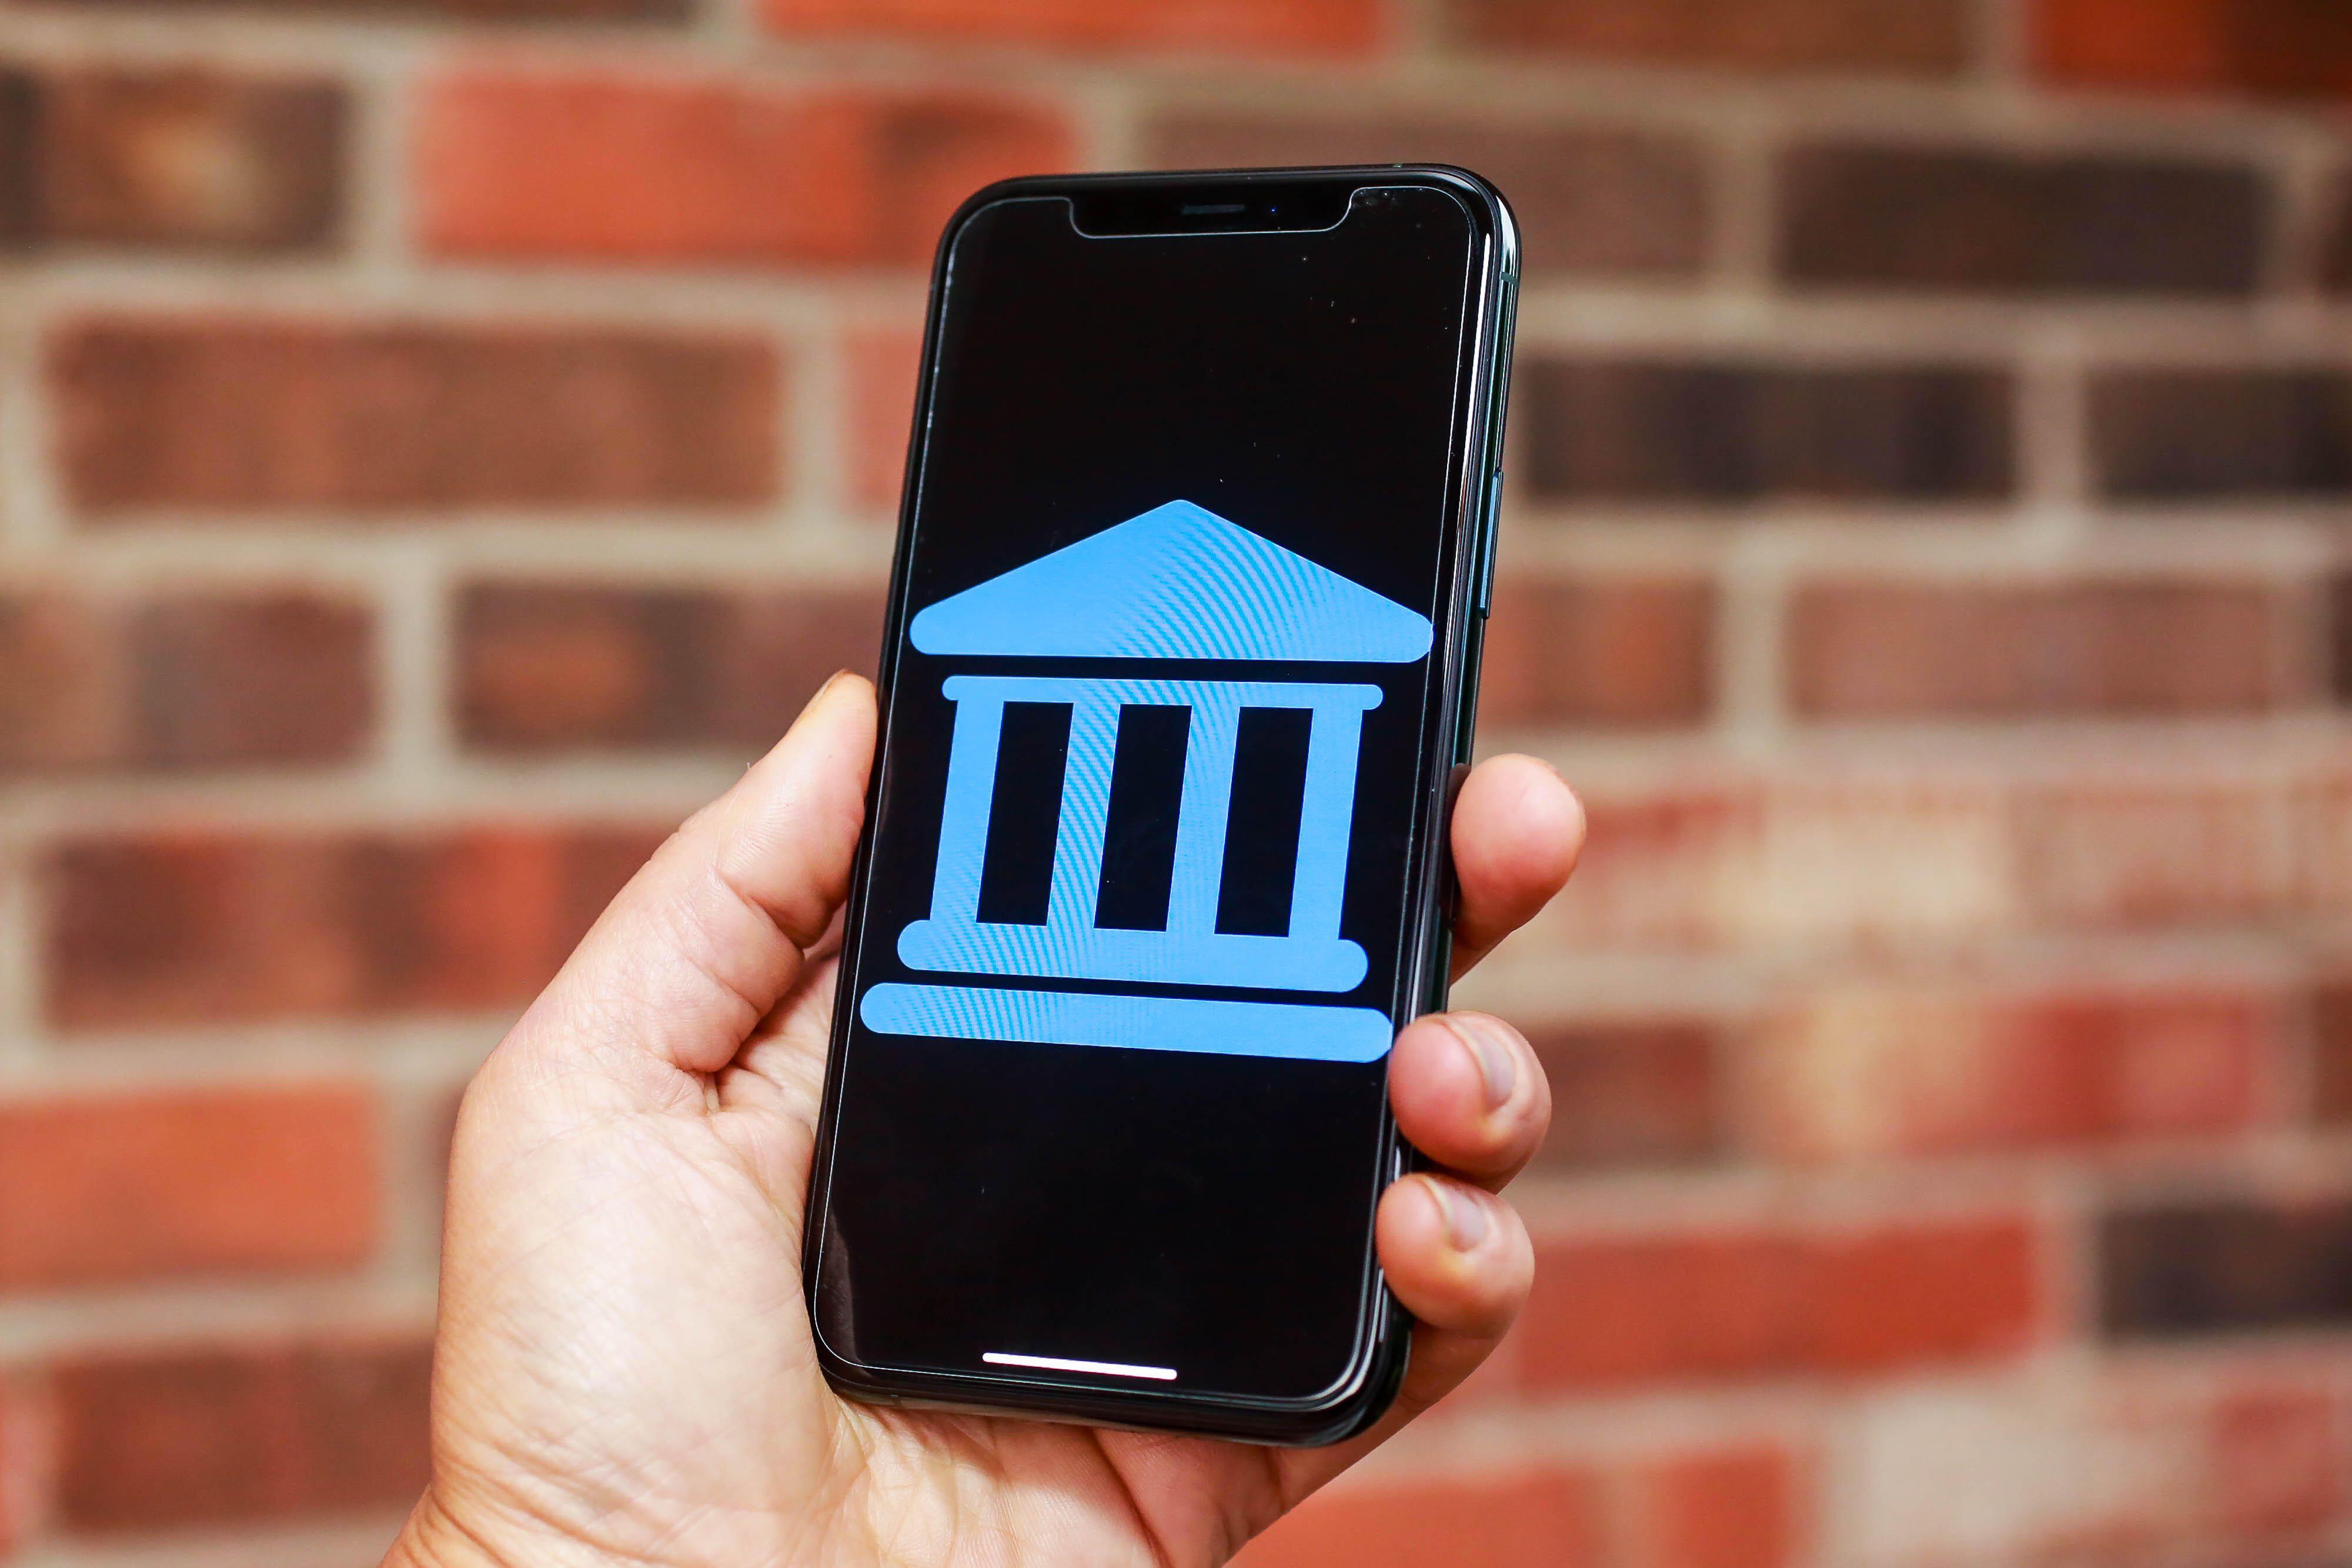 cash-money-savings-digital-banking-online-stimulus-check-phone-app-2020-009